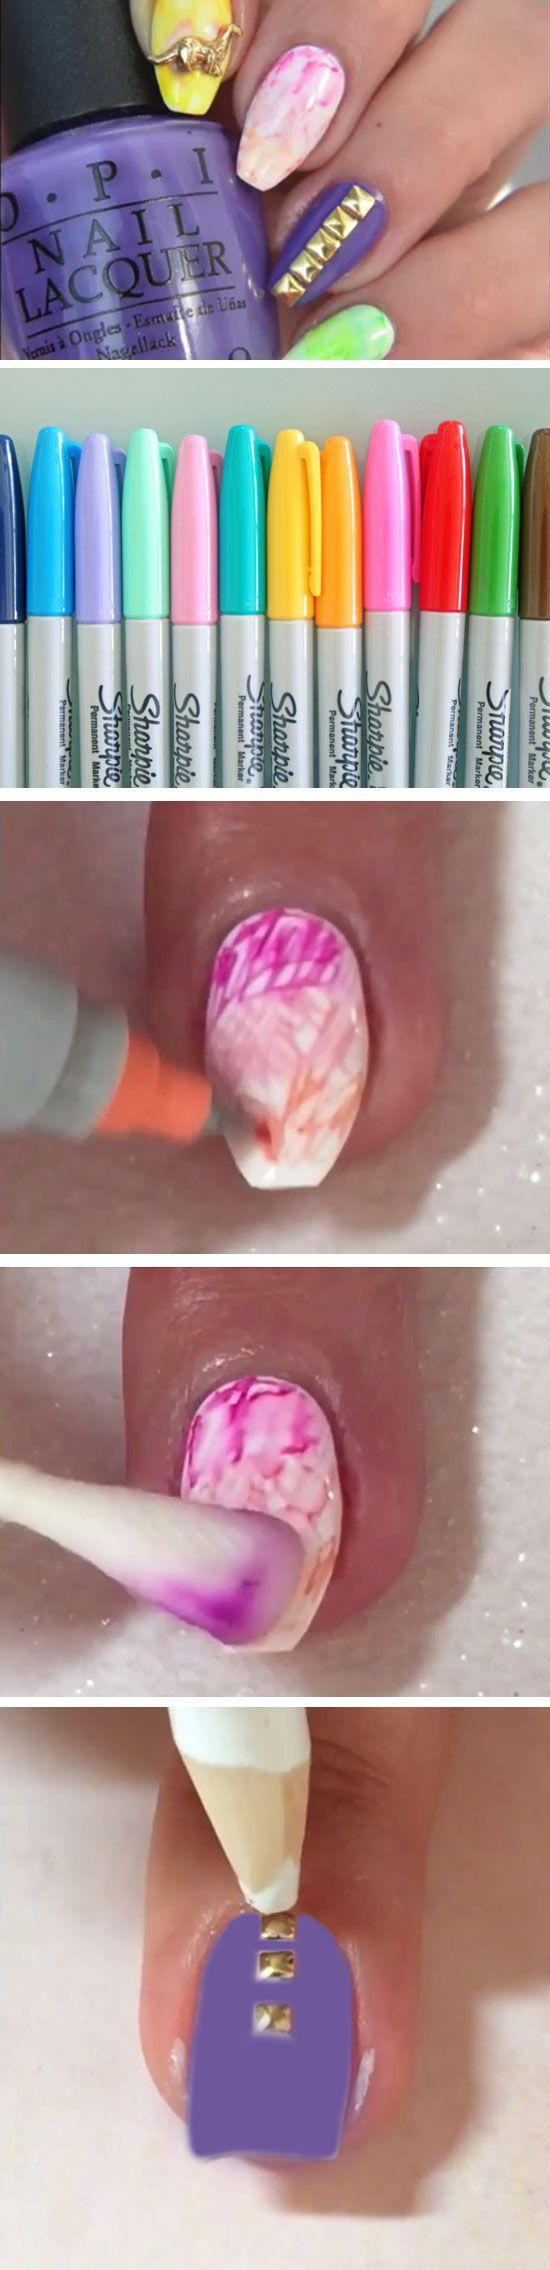 Sharpie Nail Art Click Pick For 23 Cute Summer Nail Art Ideas For